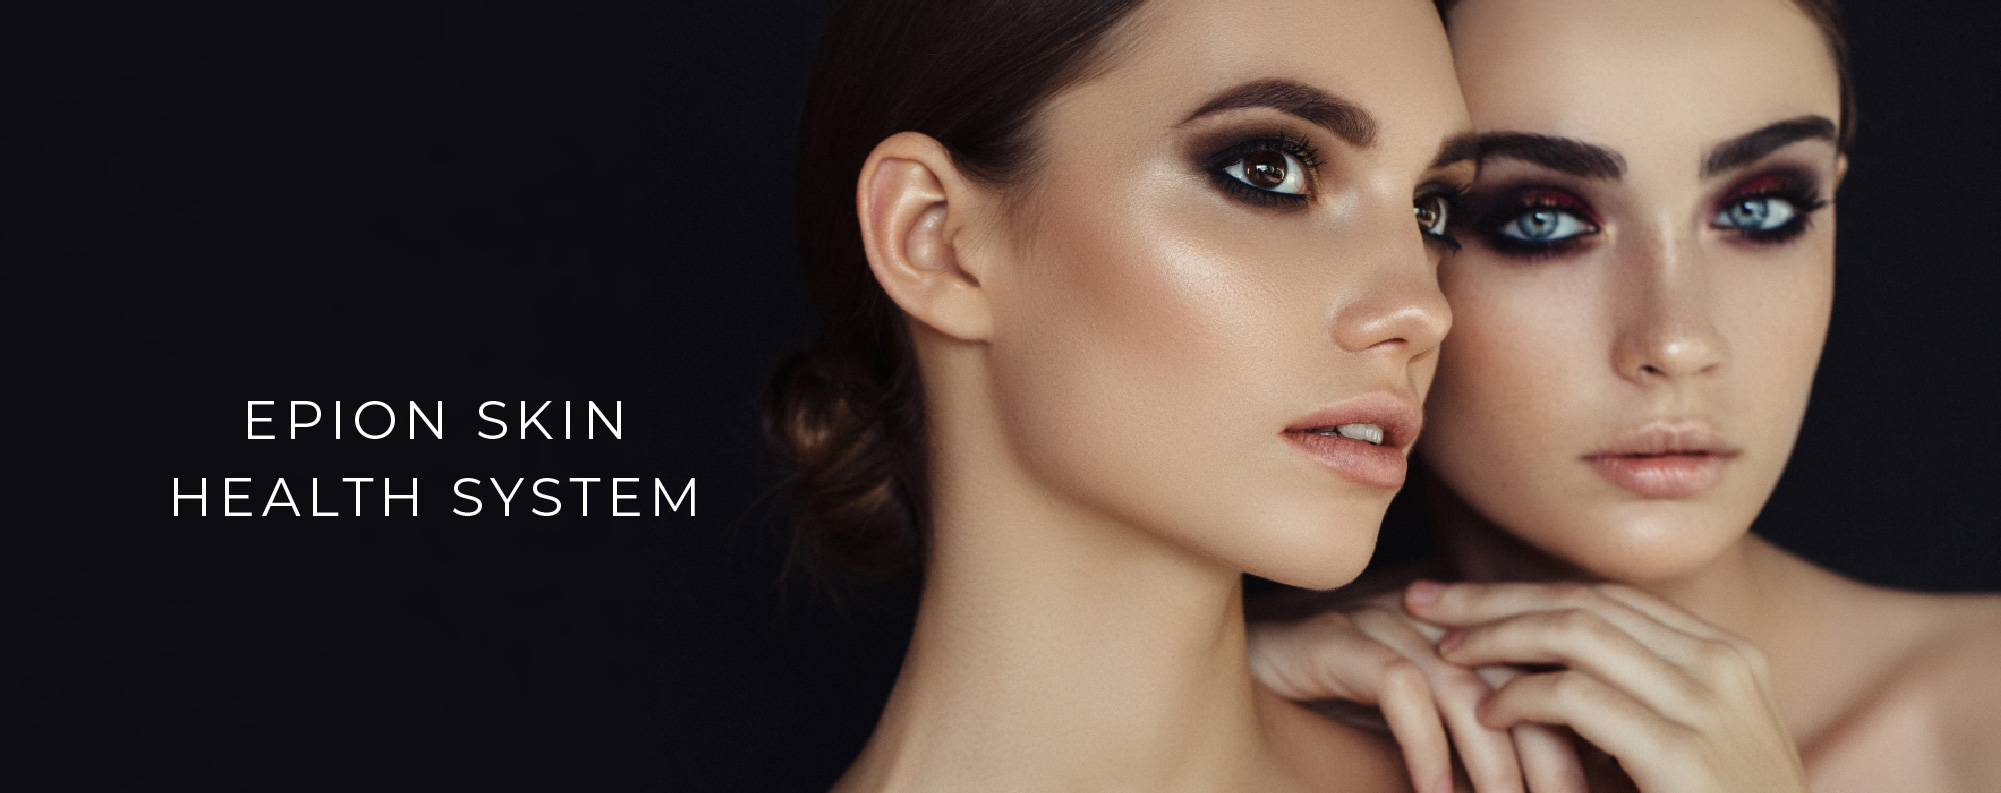 EPION Skin Health System